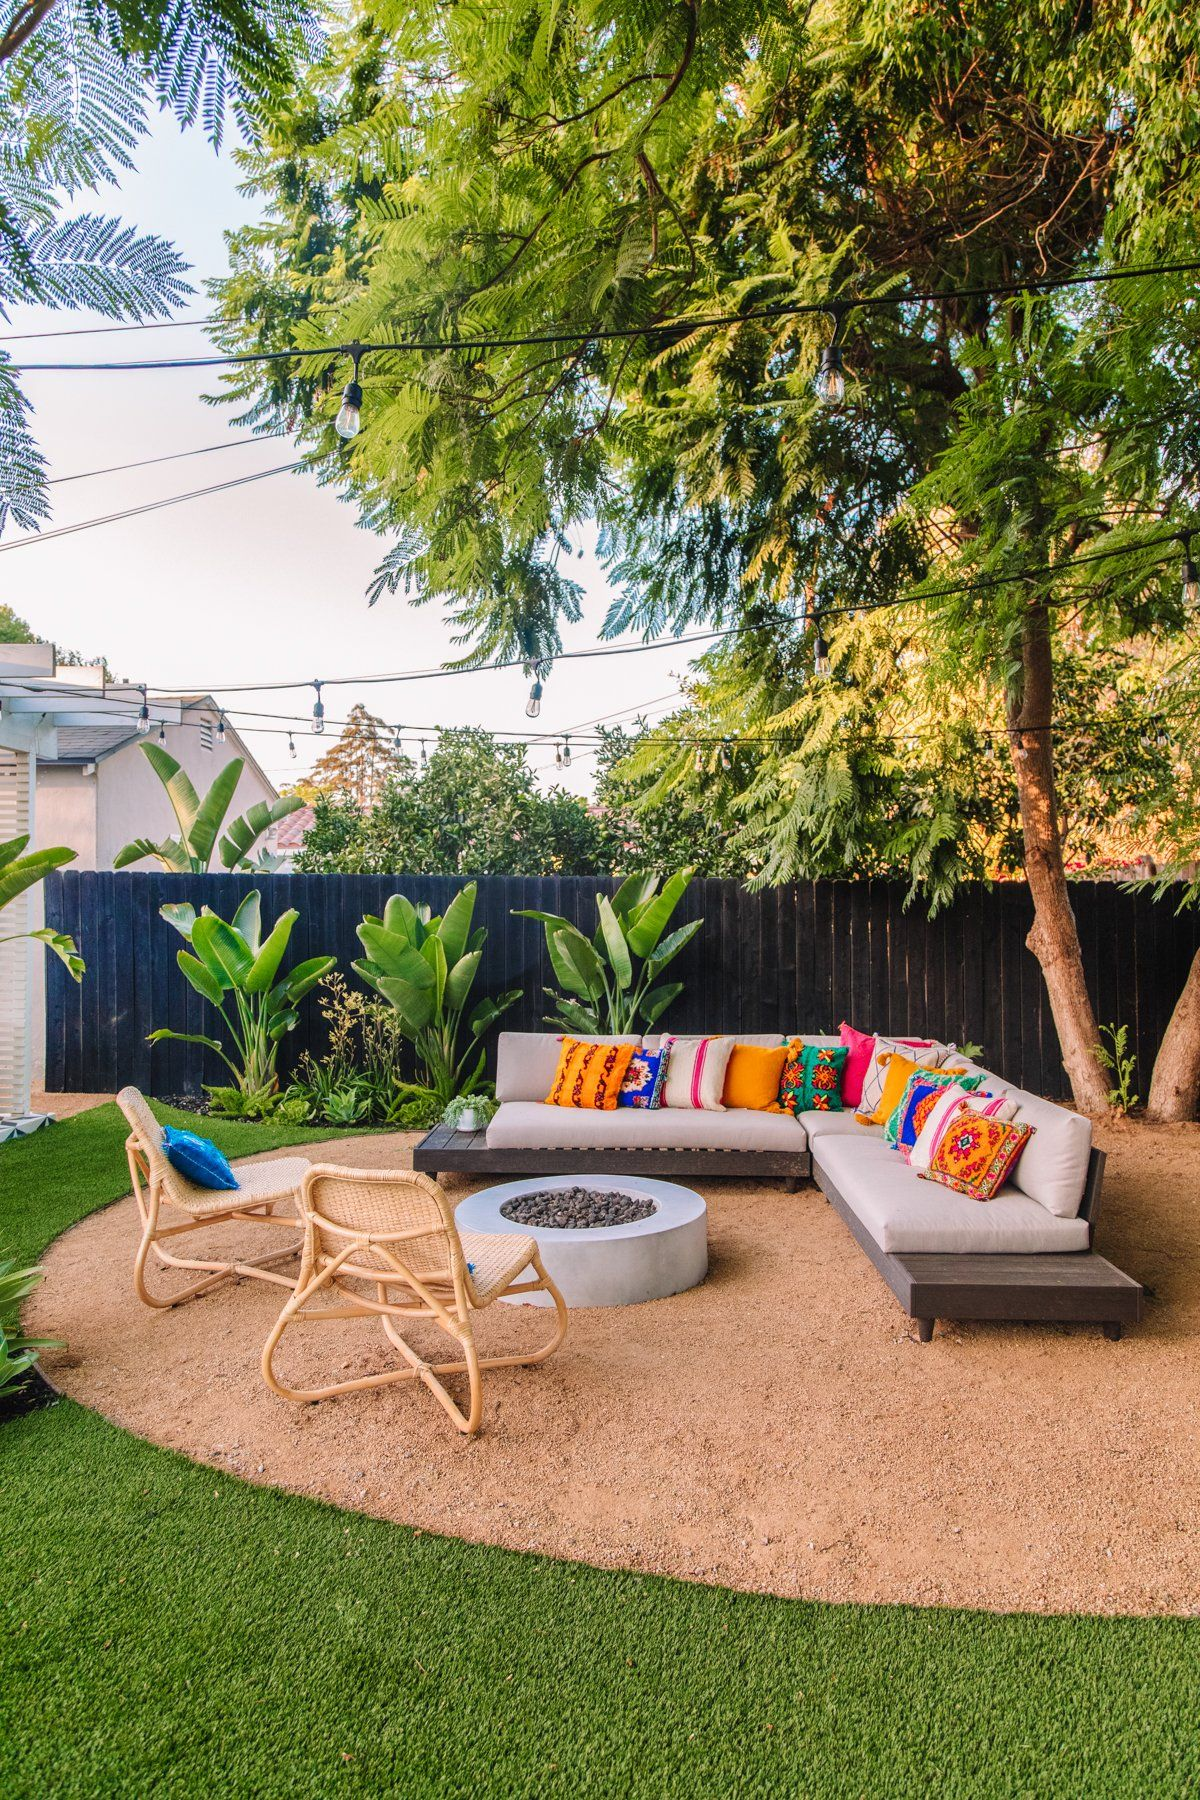 The Mindwelling Our Colorful California Backyard Reveal With Images Backyard Design California Backyard Backyard Inspiration